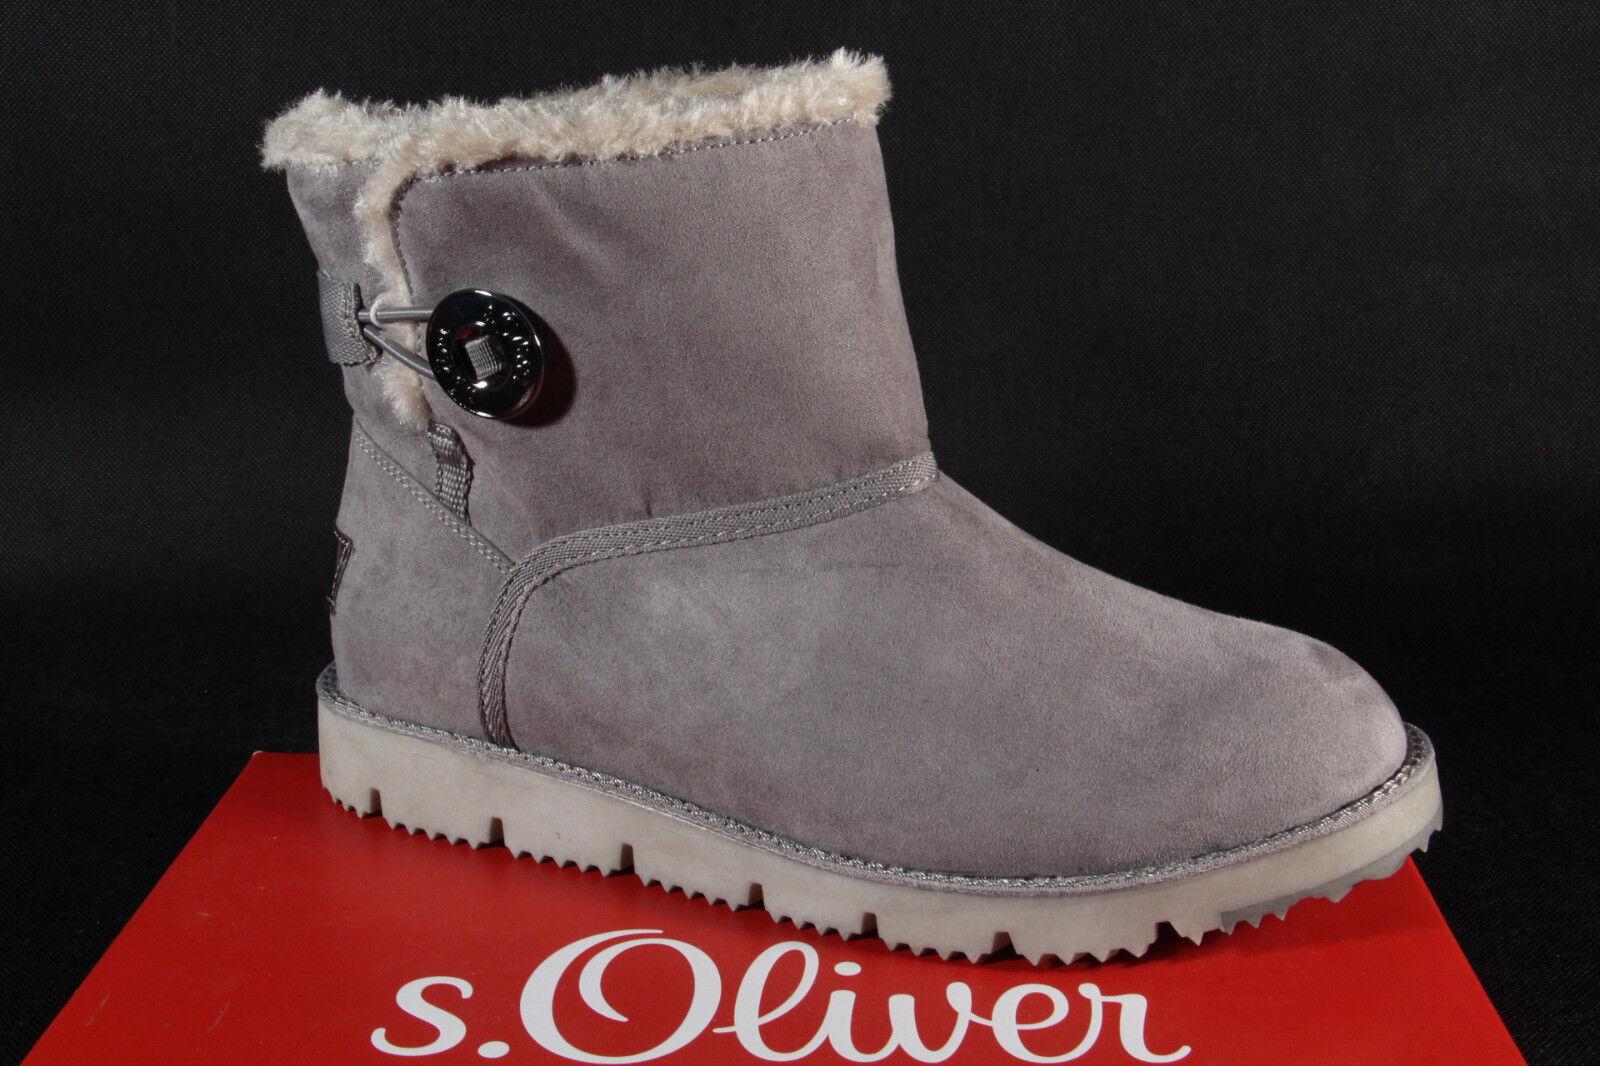 S.OLIVER Stivali Donna, Stivaletti, stivali Grigio 26412 Nuovo